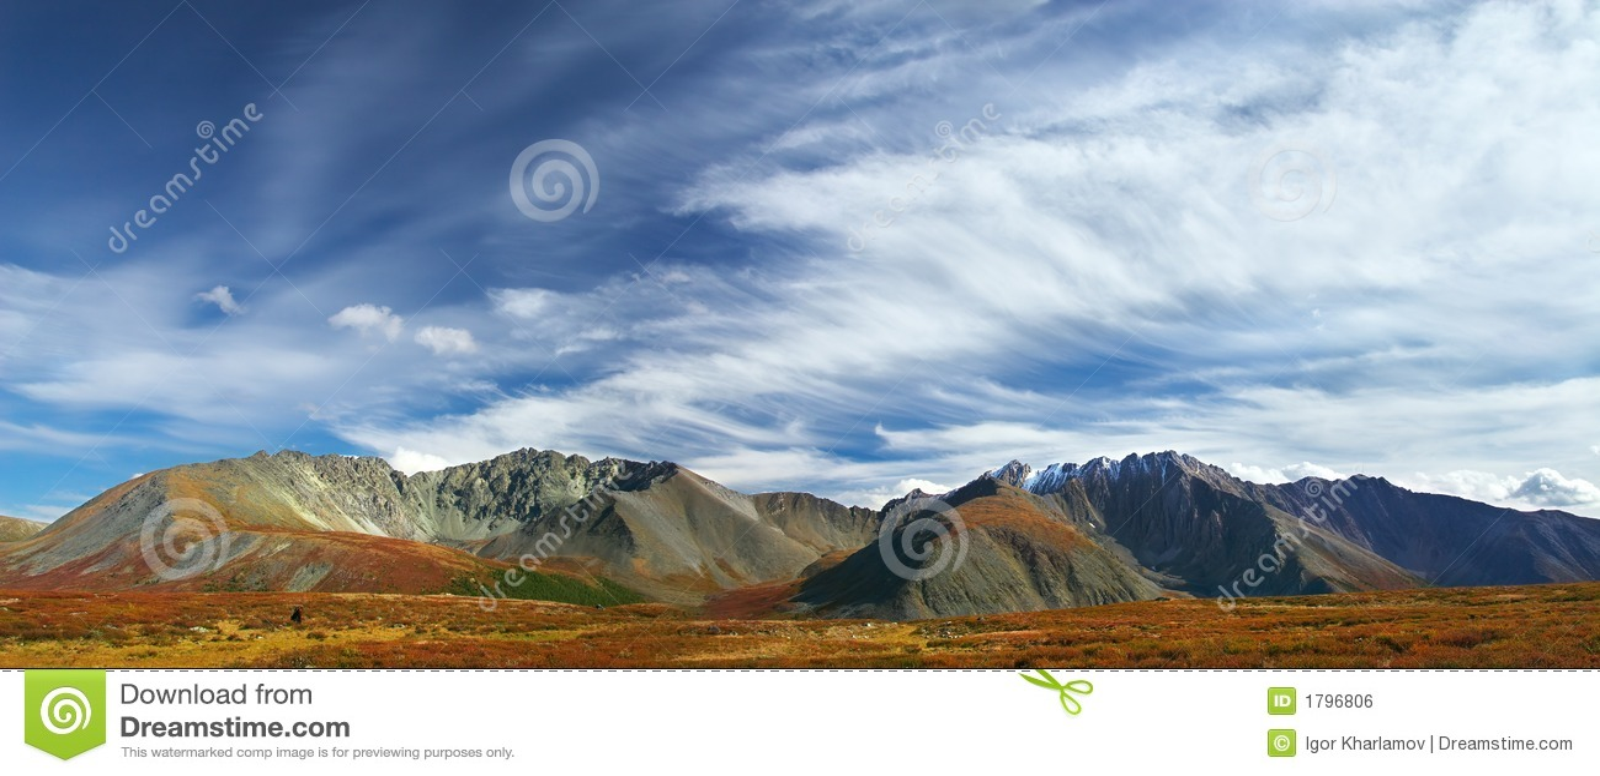 Cielo blu e montagne, panorama.